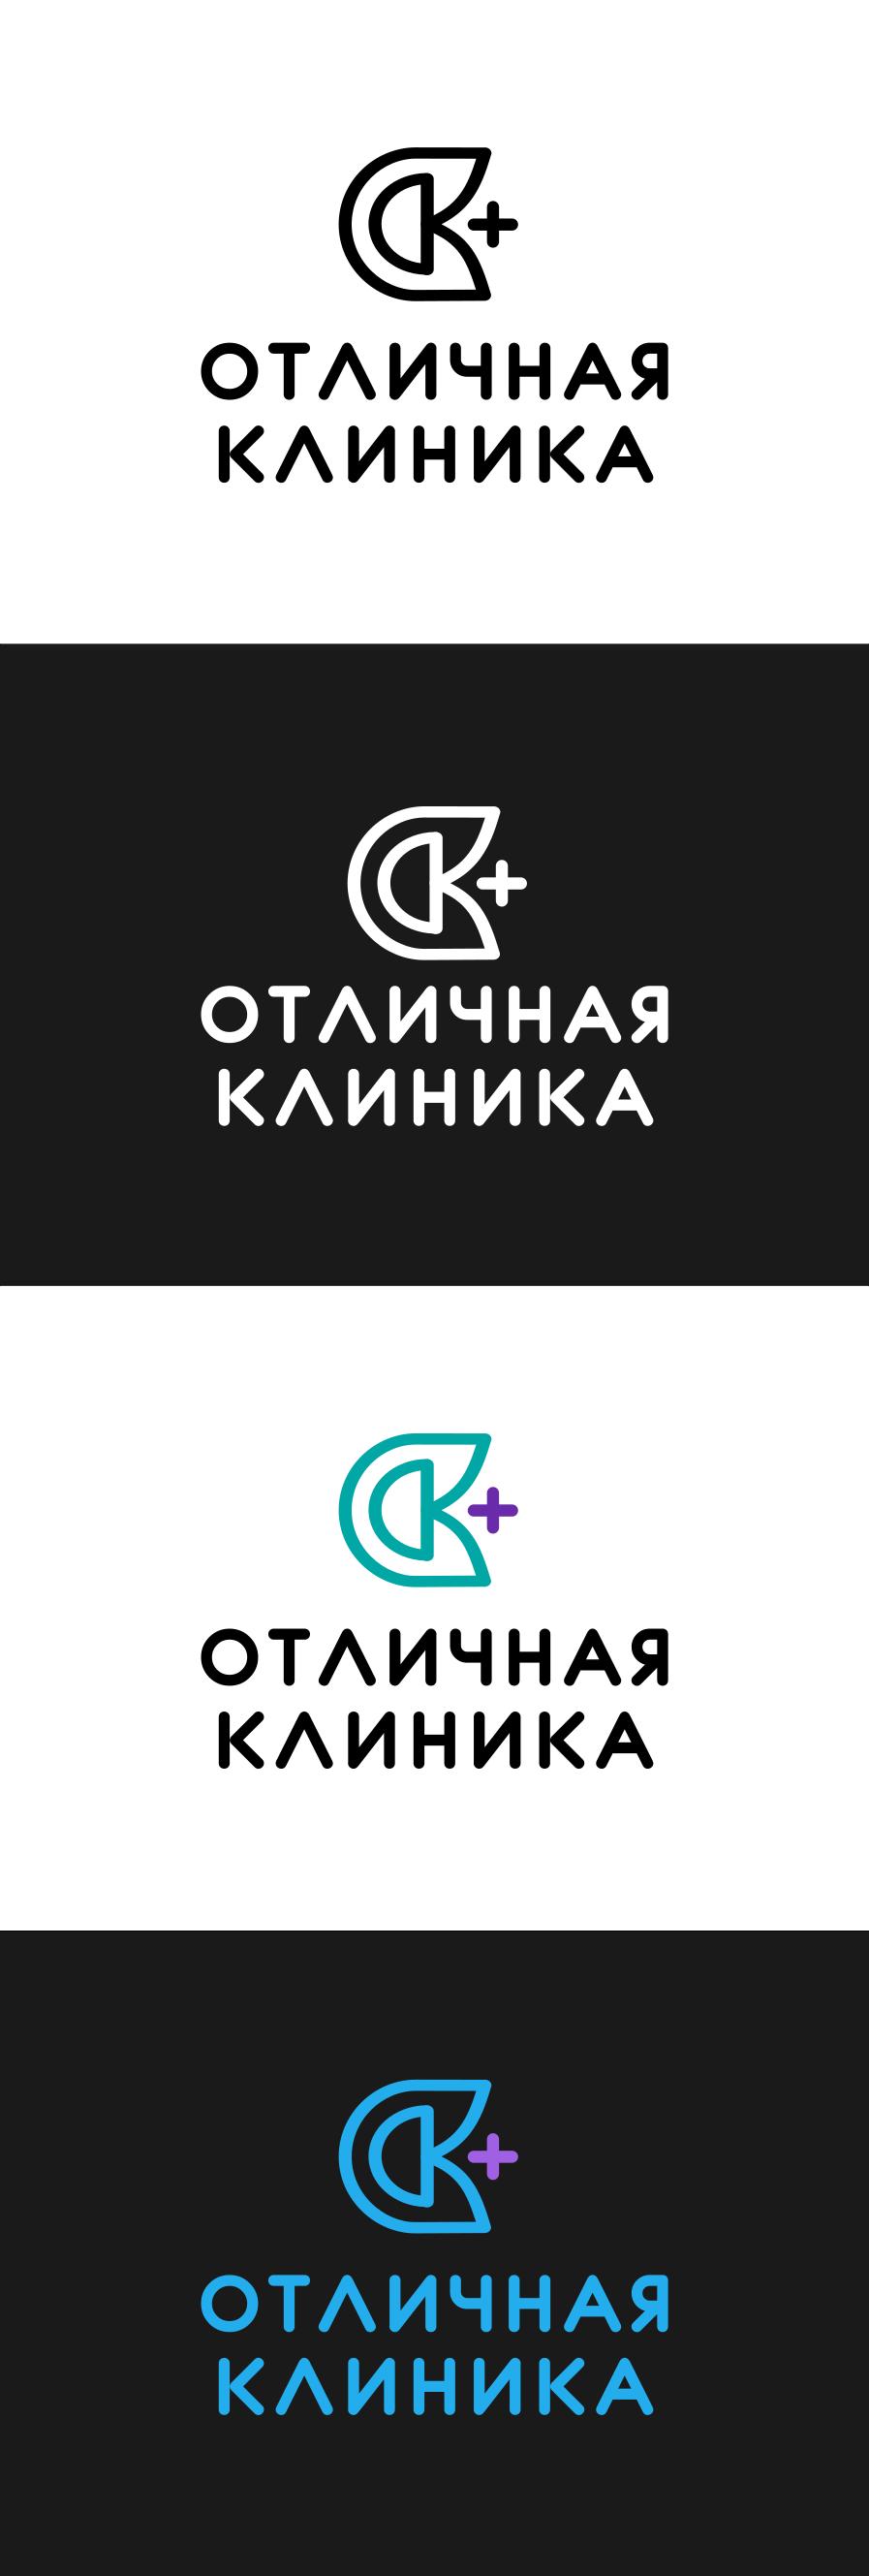 Логотип и фирменный стиль частной клиники фото f_1775c8faa8ebdf3e.png